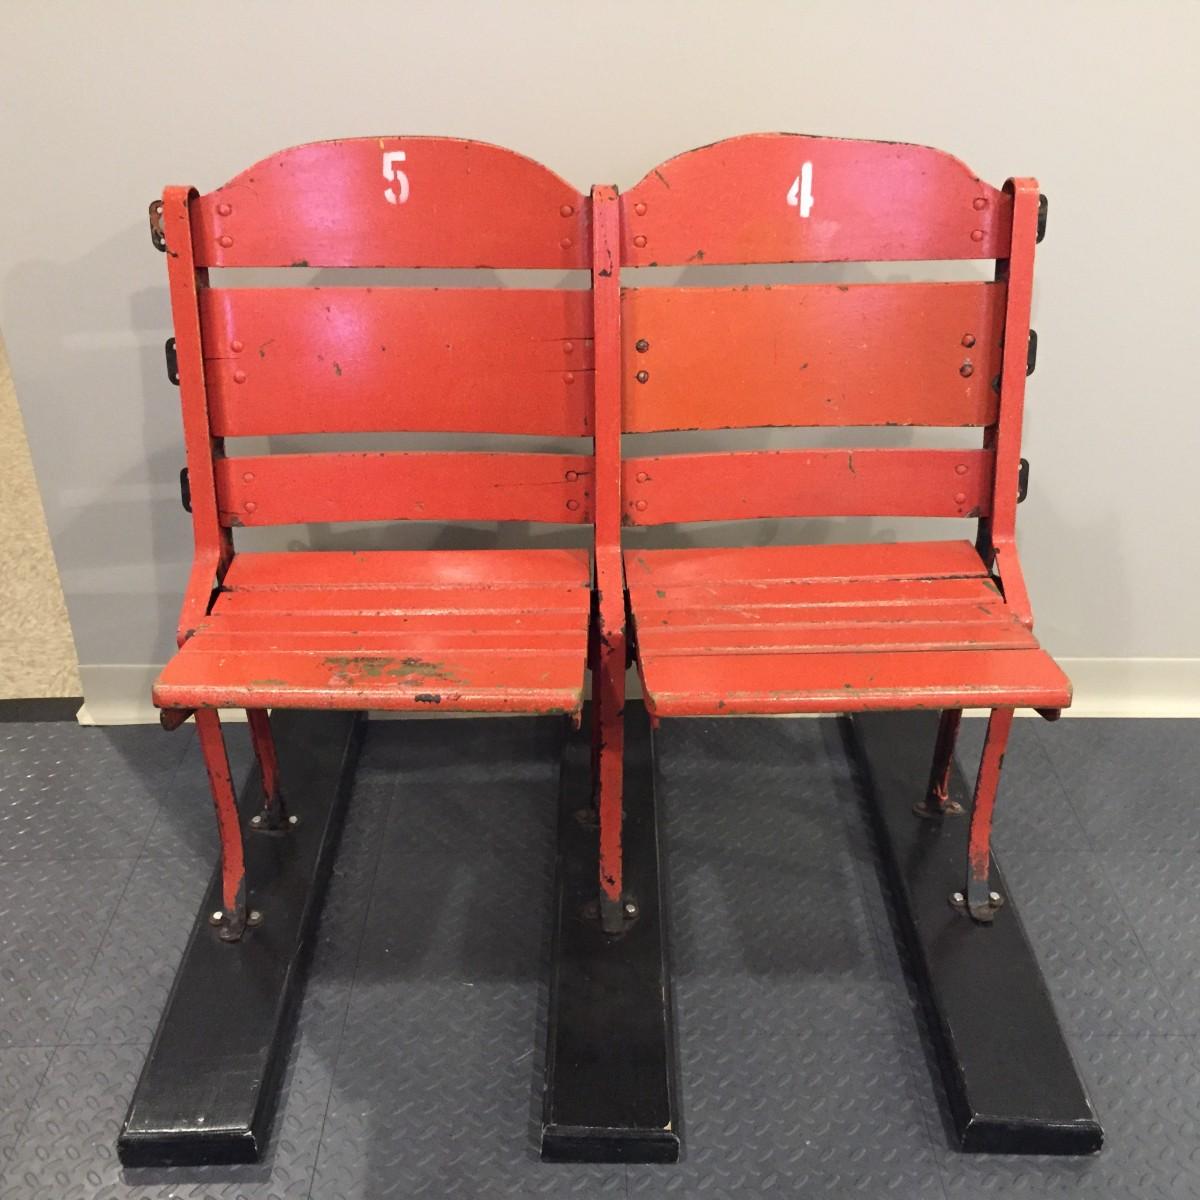 chair covers giant tiger physio ball sports memorabilia denorabilia